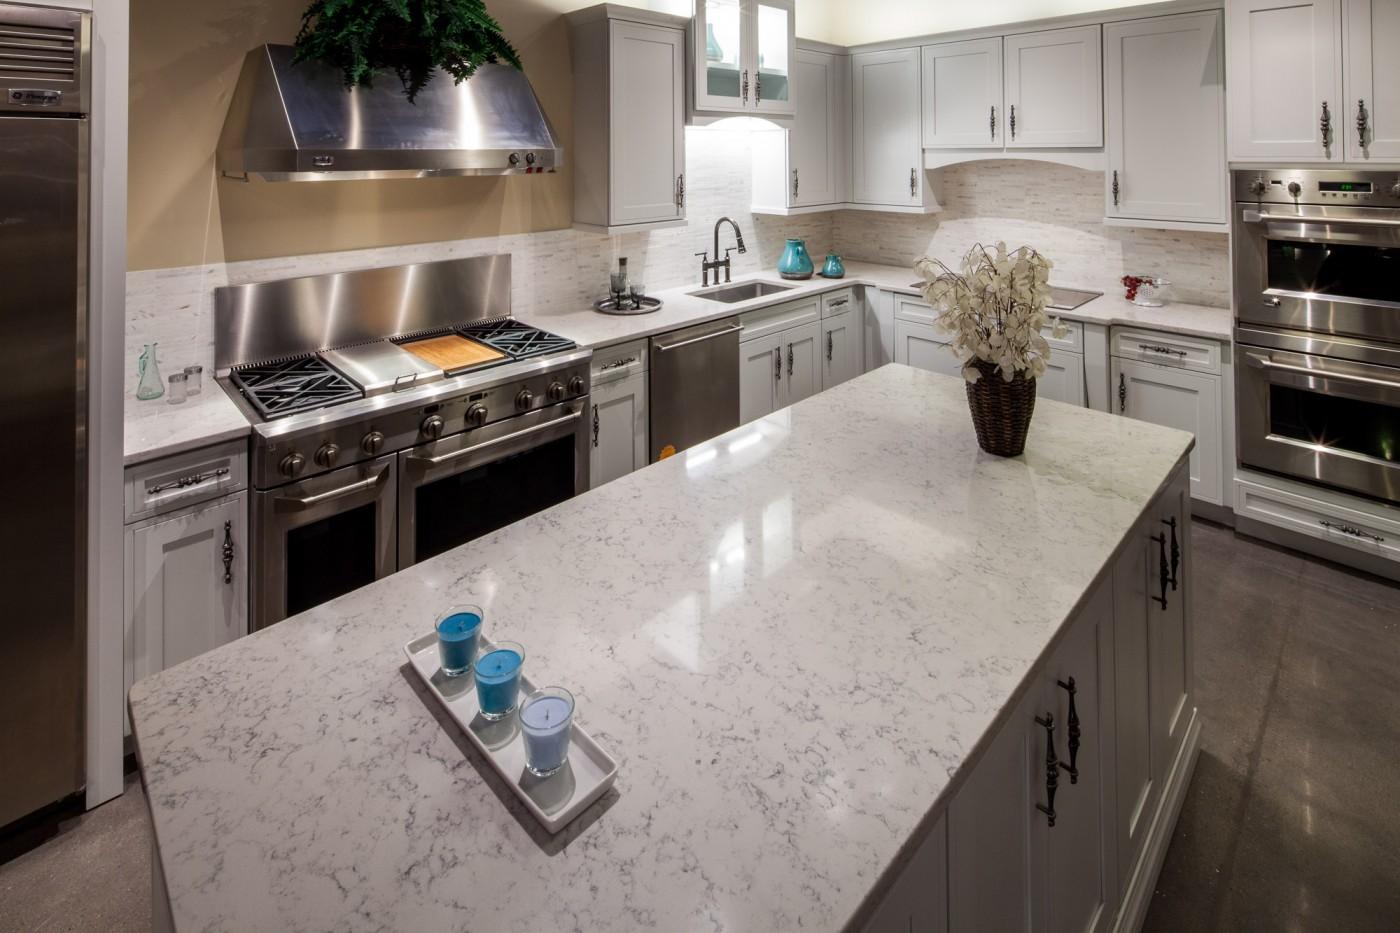 newviewgranite quartz kitchen countertops 3cm Lyra Silestone Kitchen Pencil edge Details 3cm Lyra Silestone Kitchen Pencil edge Details